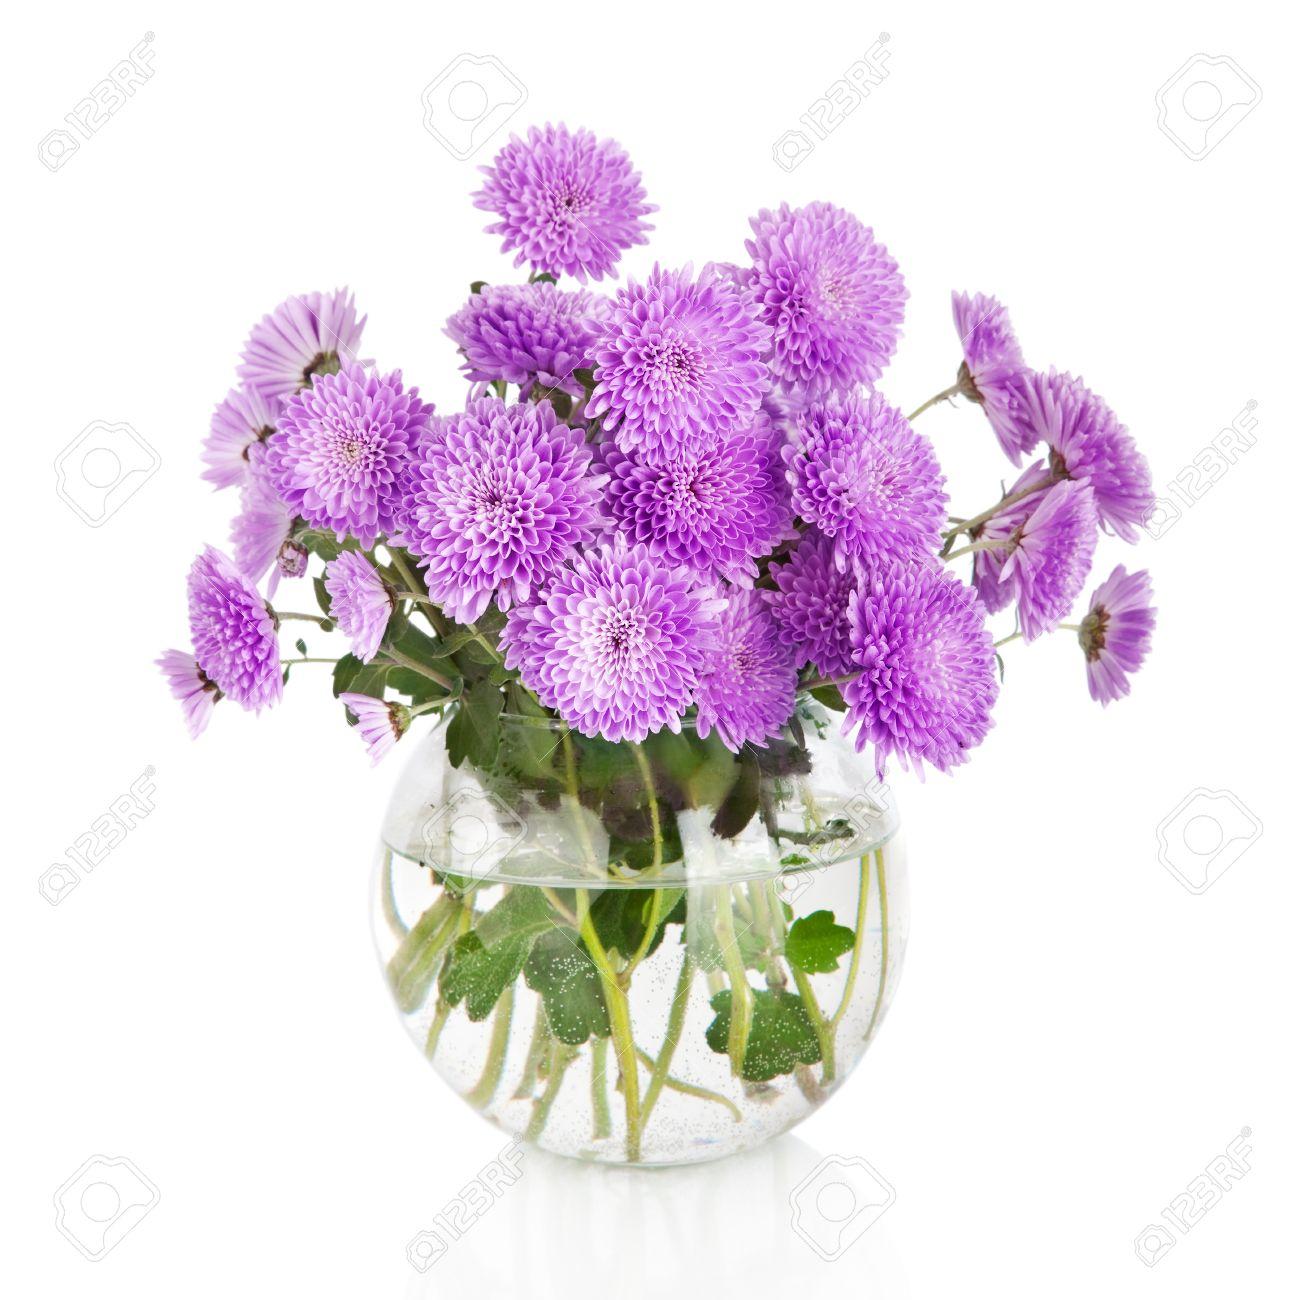 Bouquet of many beautiful chrysanthemum flowers in glass vase bouquet of many beautiful chrysanthemum flowers in glass vase isolated on white background stock photo reviewsmspy